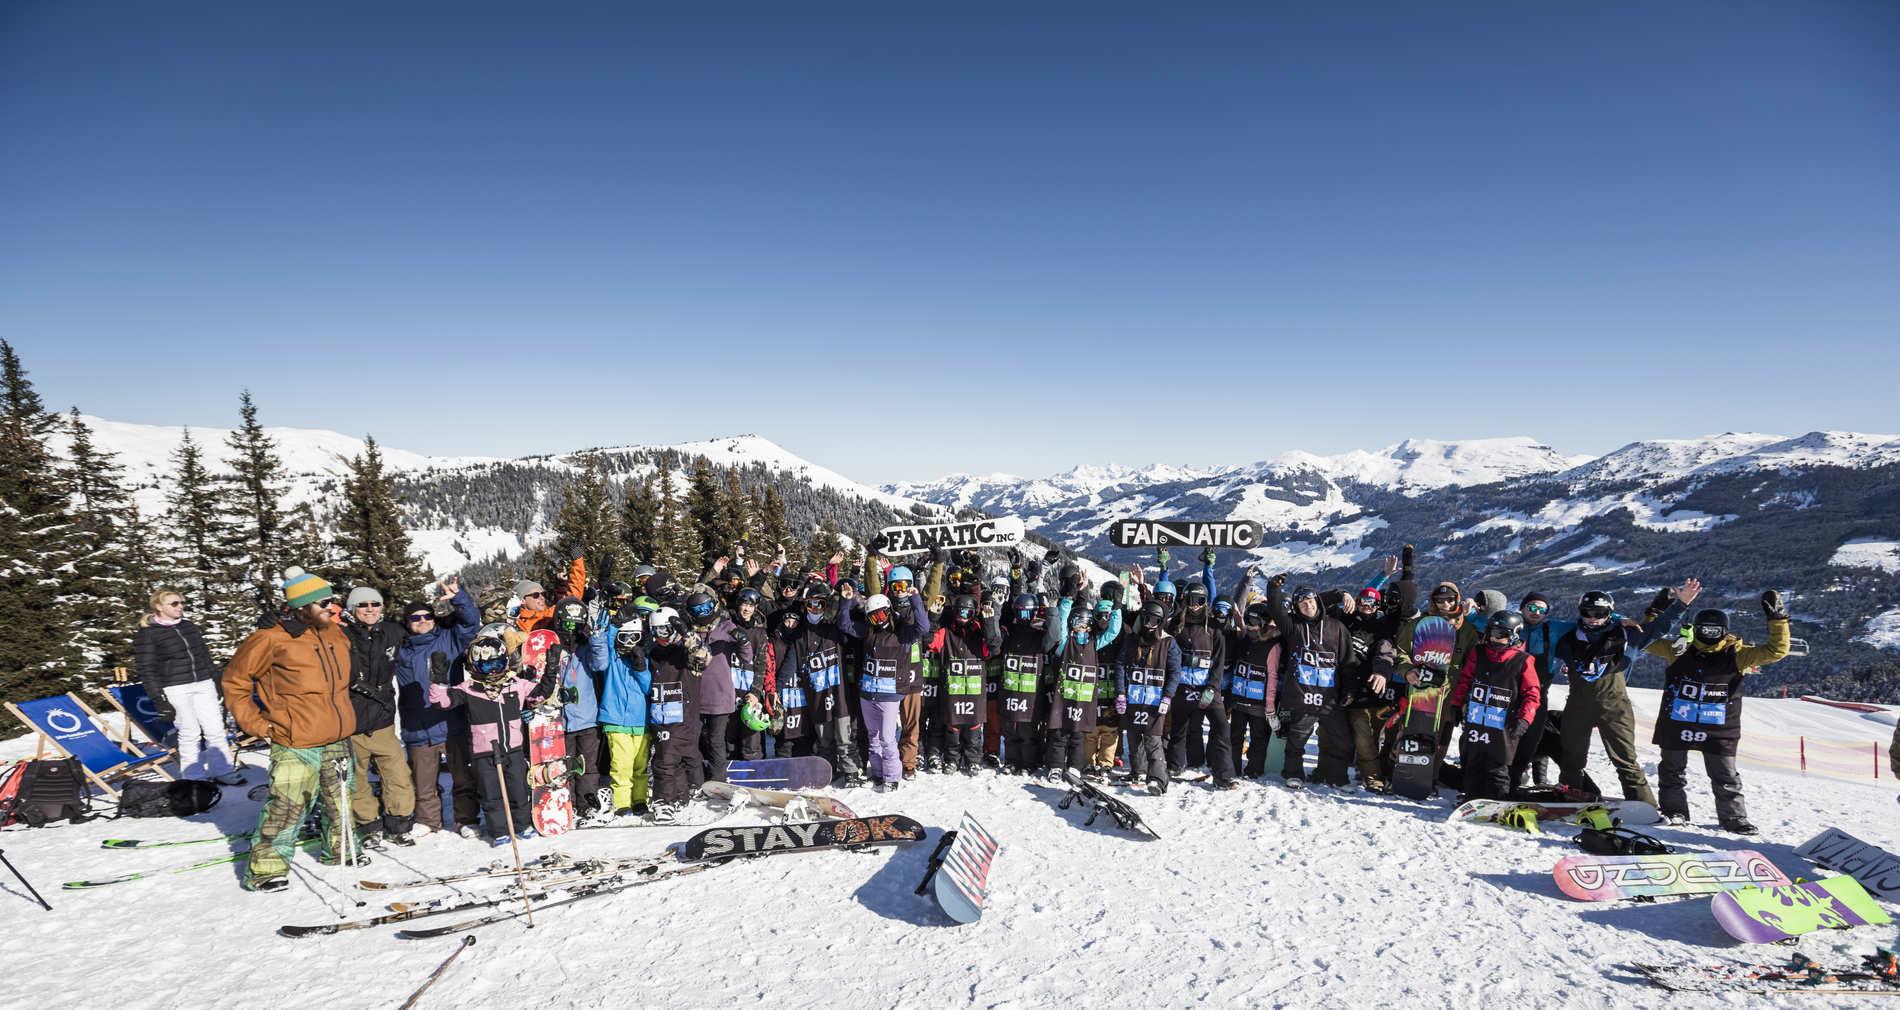 Sick Trick Tour Open 2017 im Snowpark Kitzbühel - Galerie